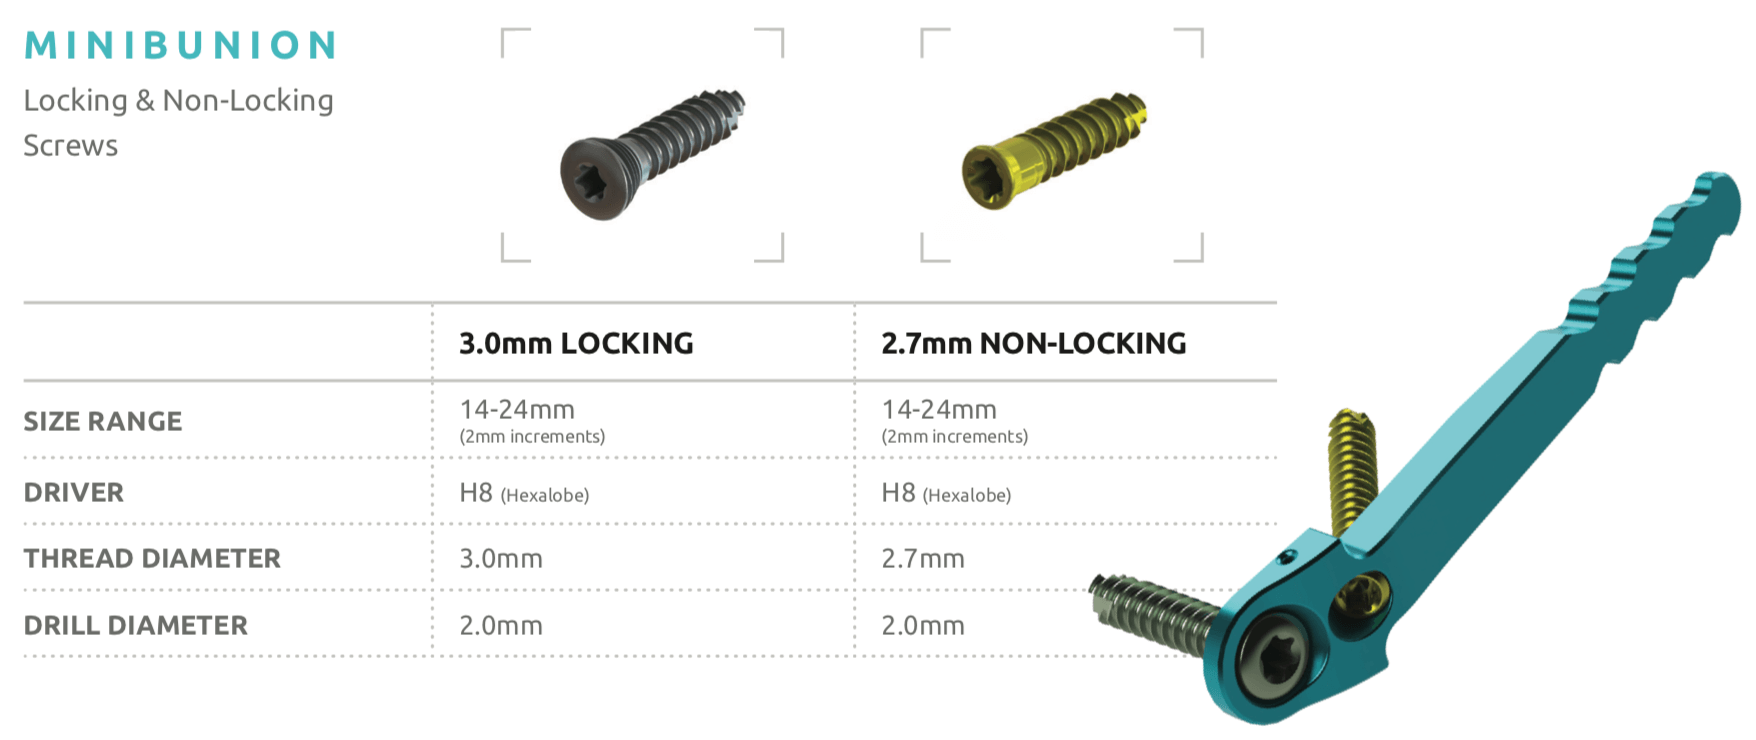 CrossRoads MINIBunion locking and Non-Locking Screws